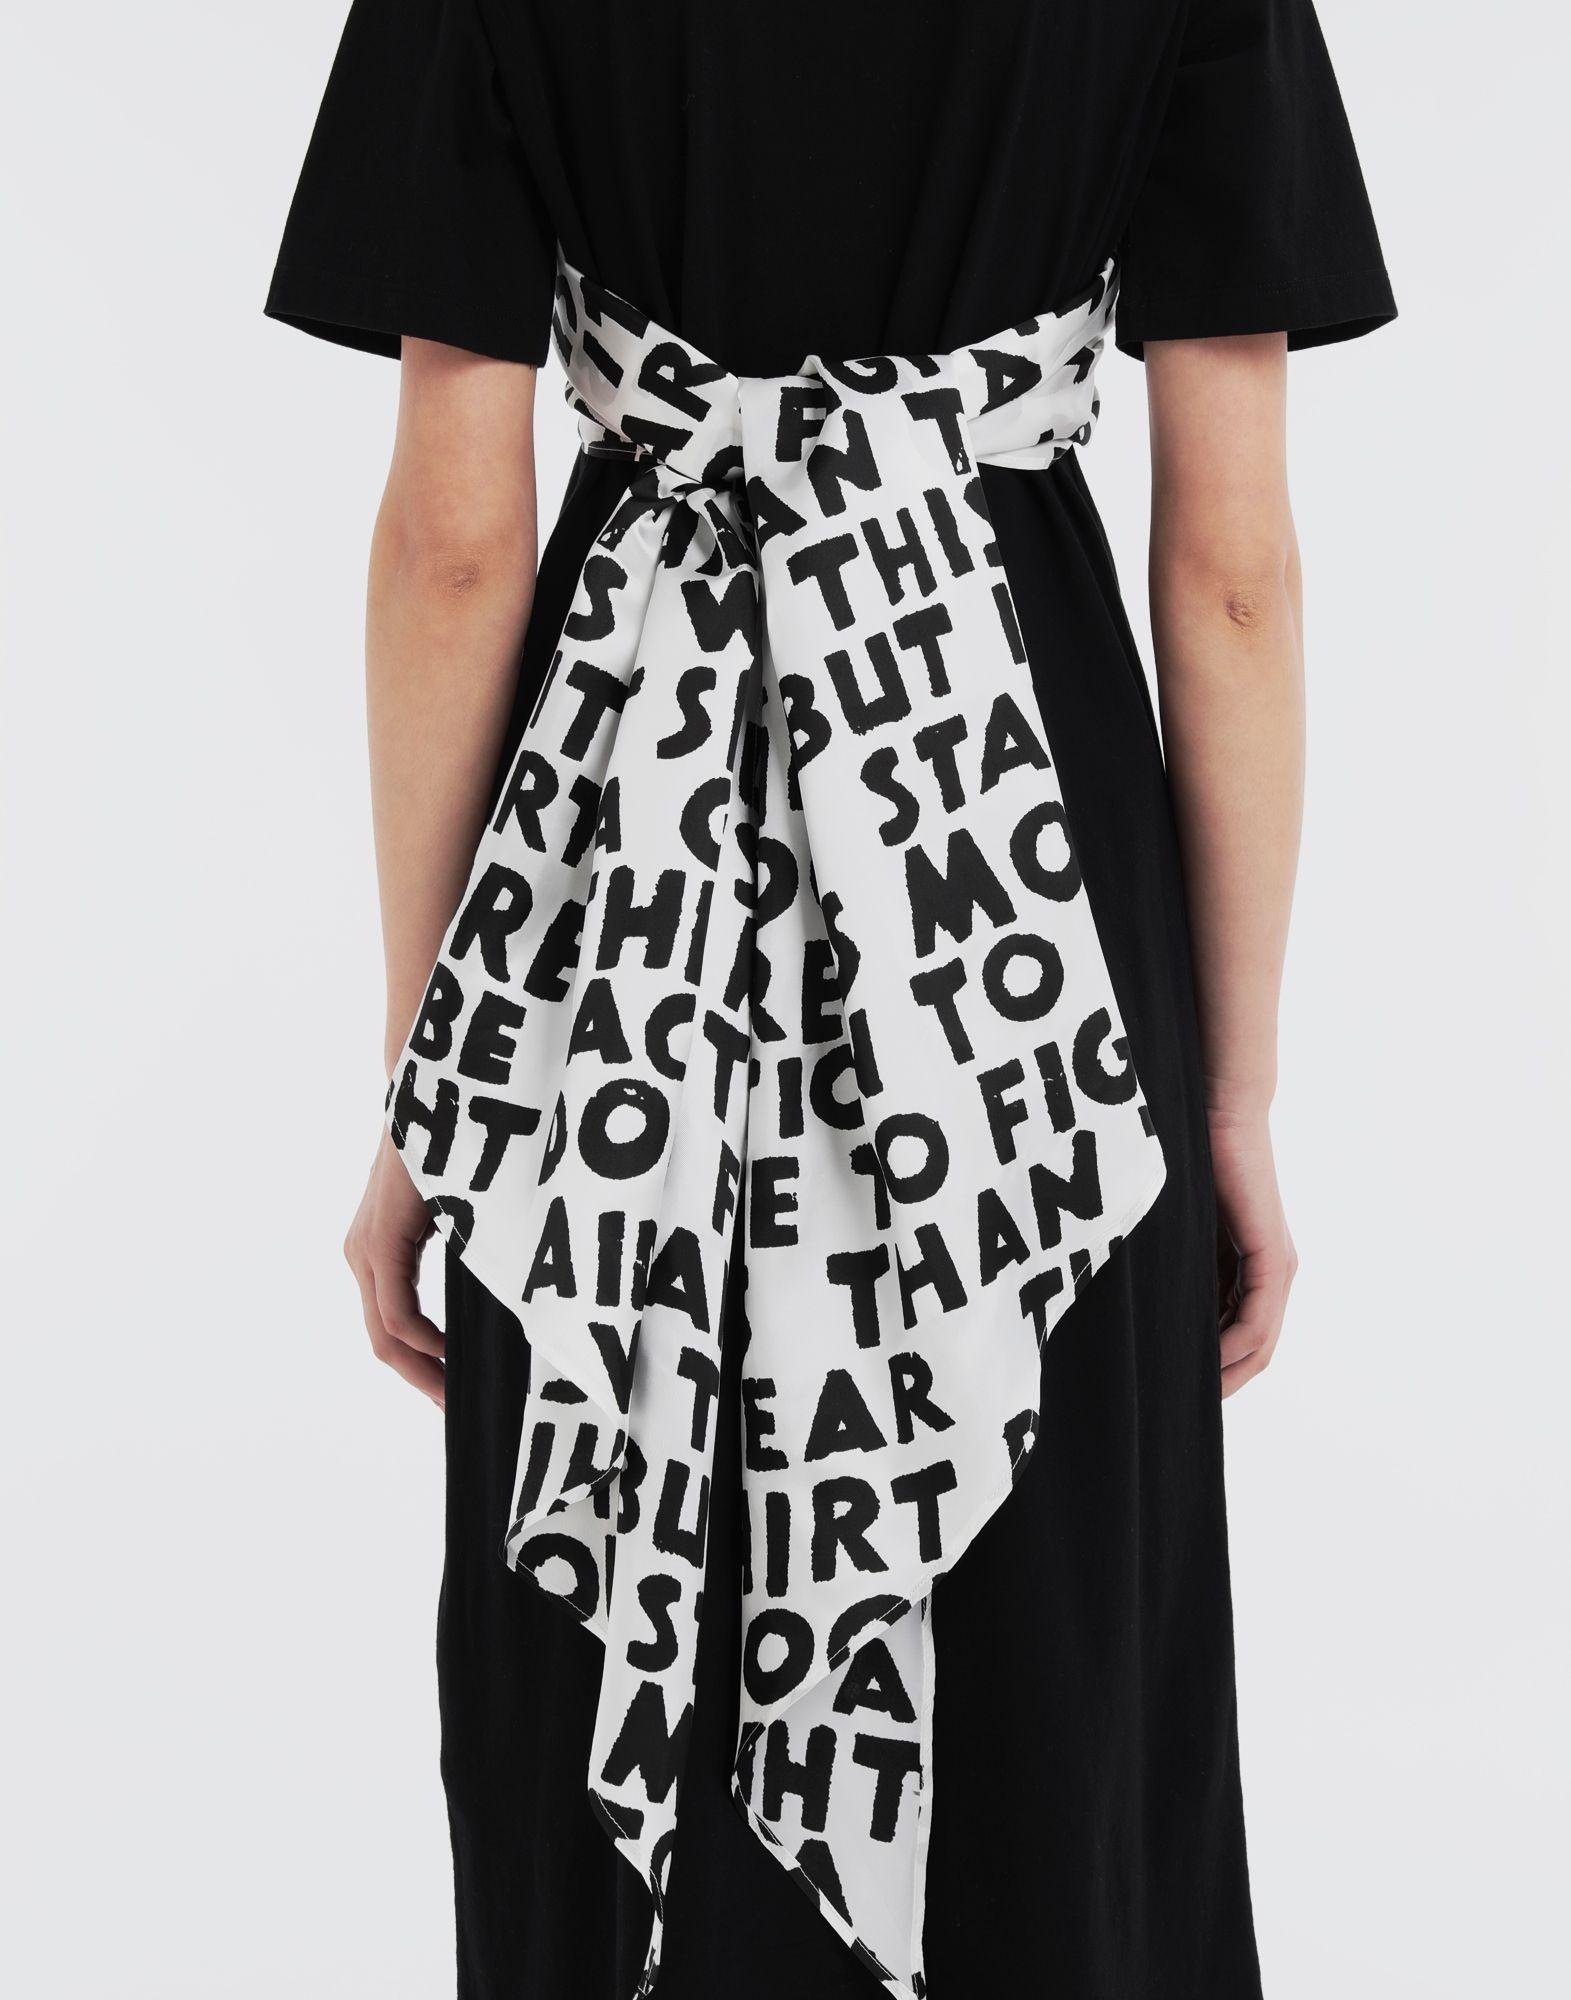 MM6 MAISON MARGIELA Scarf tie dress Short dress Woman b